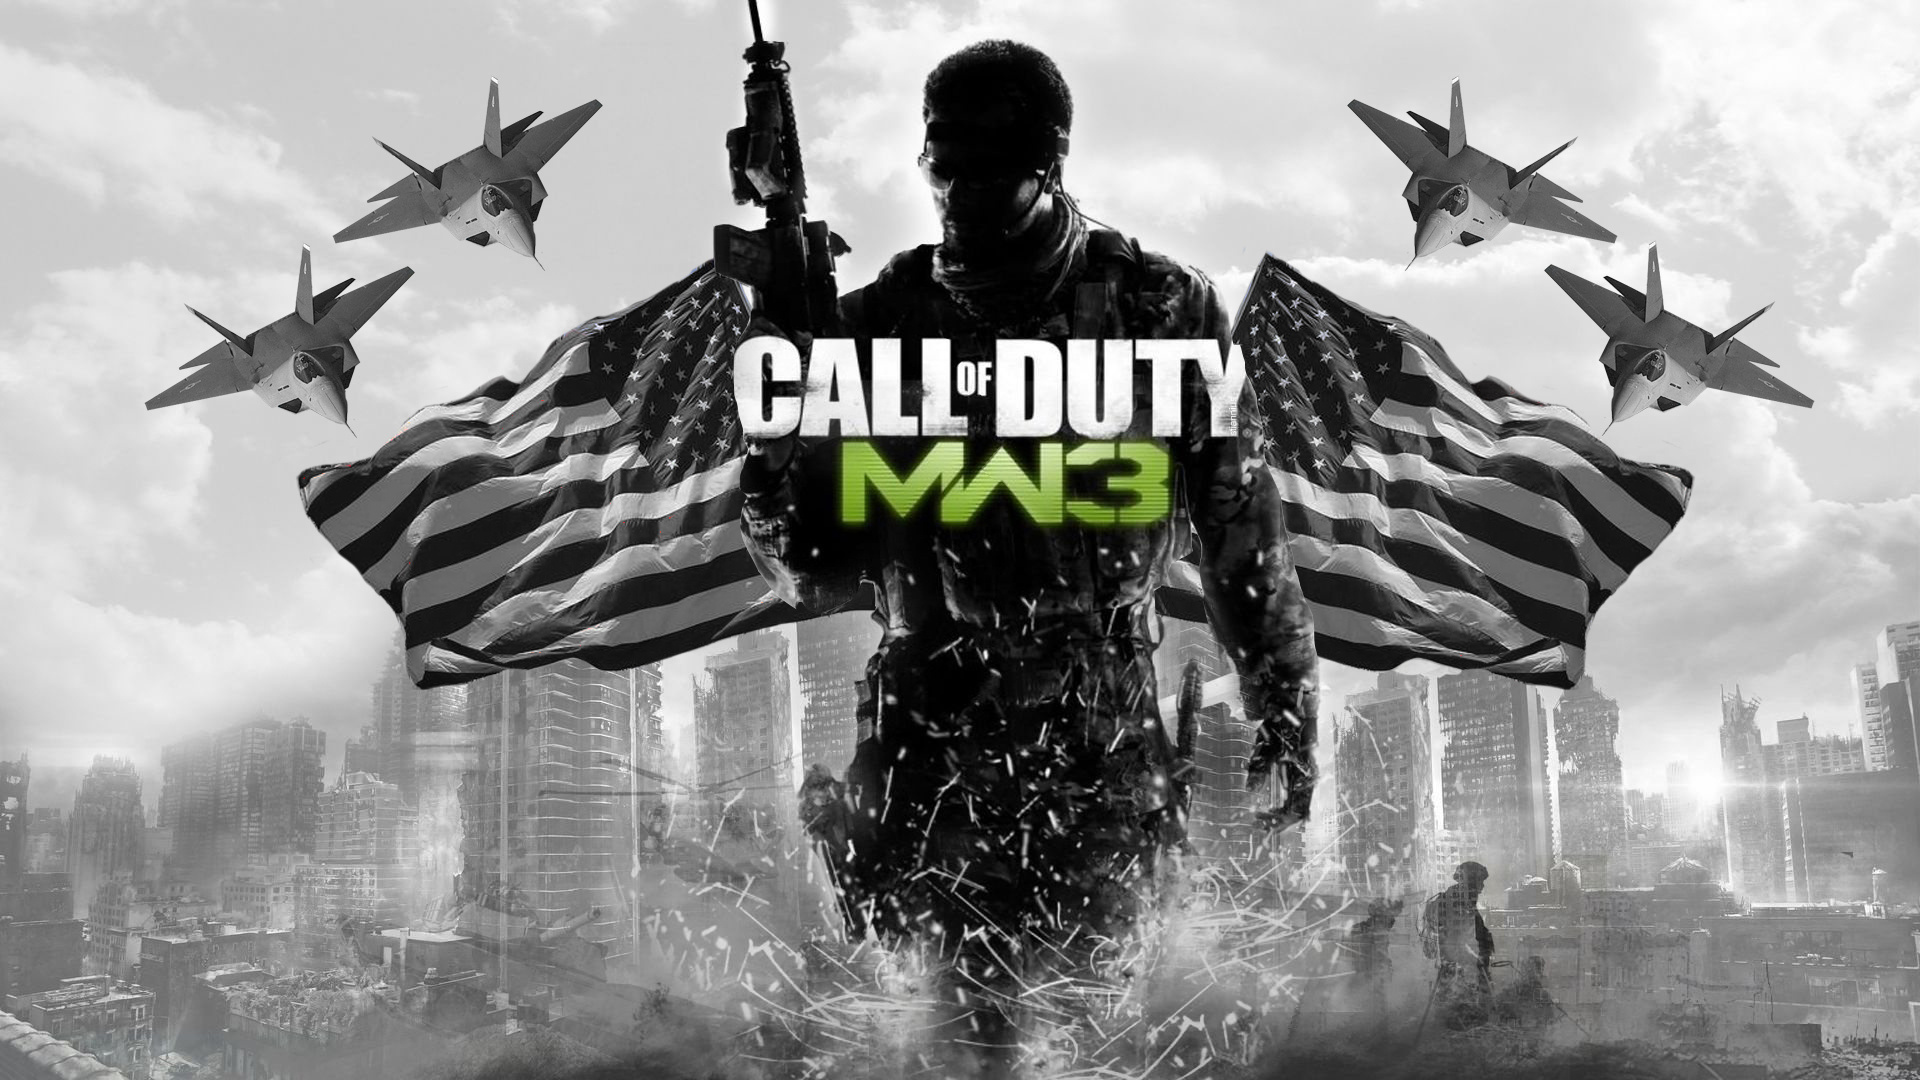 Get Free Call of duty Modern Warfare 3 Cheats | Call of Duty